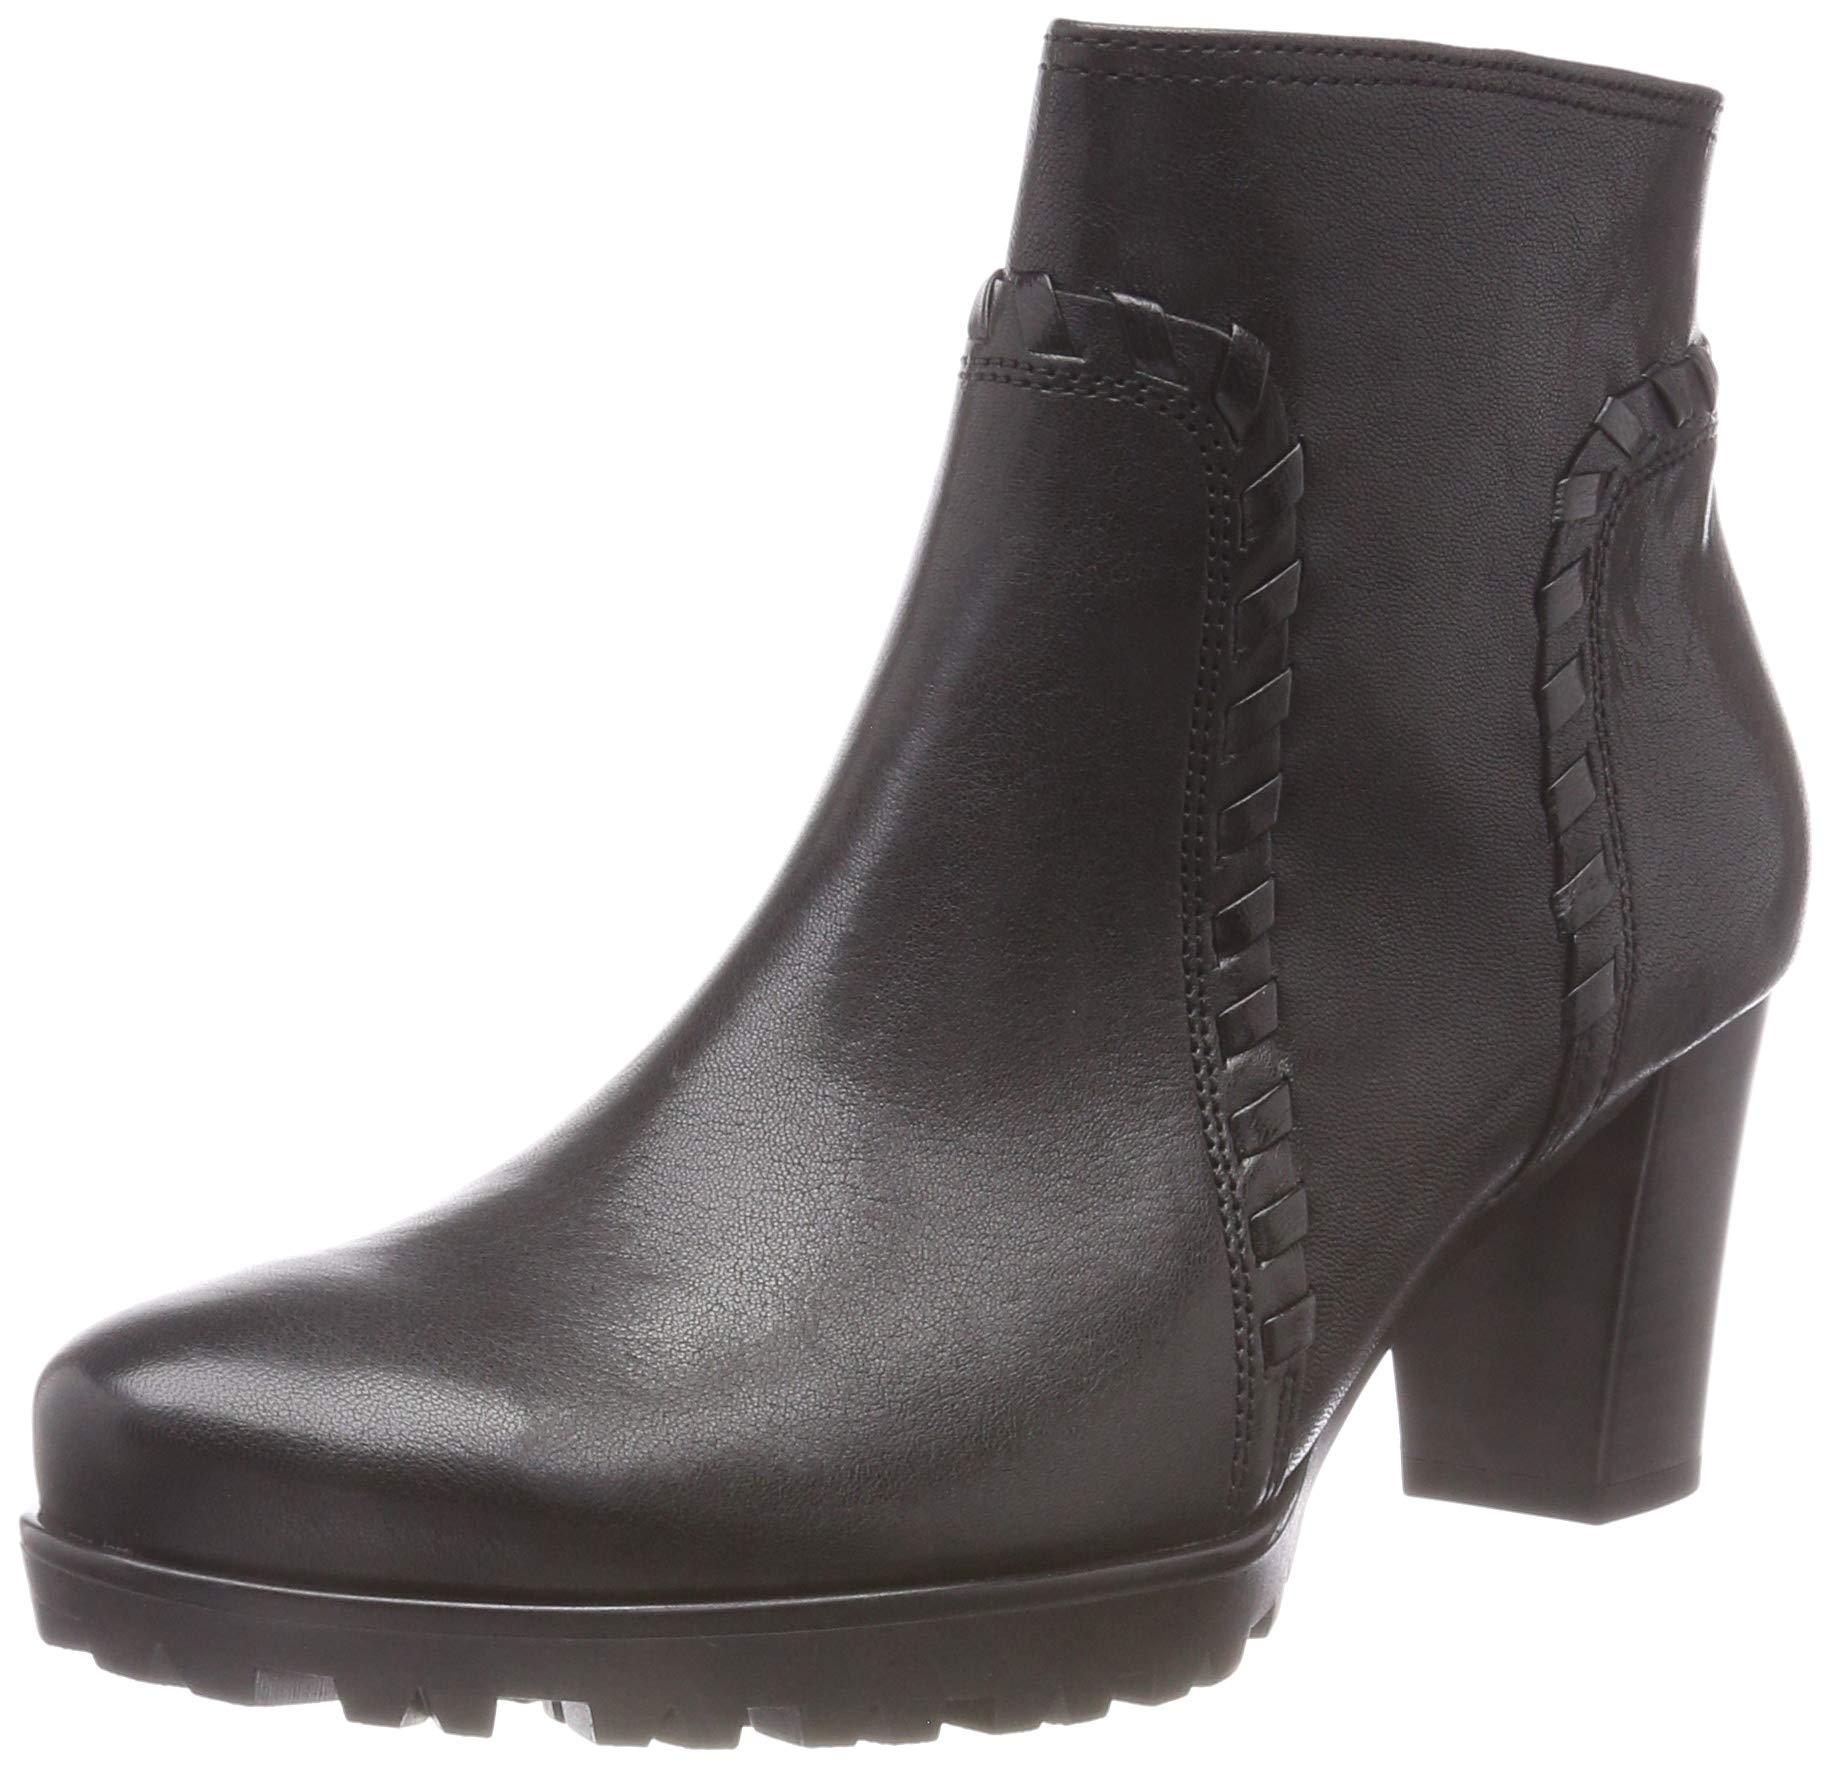 Comfort SportBotines Eu Gabor Shoes FemmeNoirschwarzmicro2740 l3FJTcK1